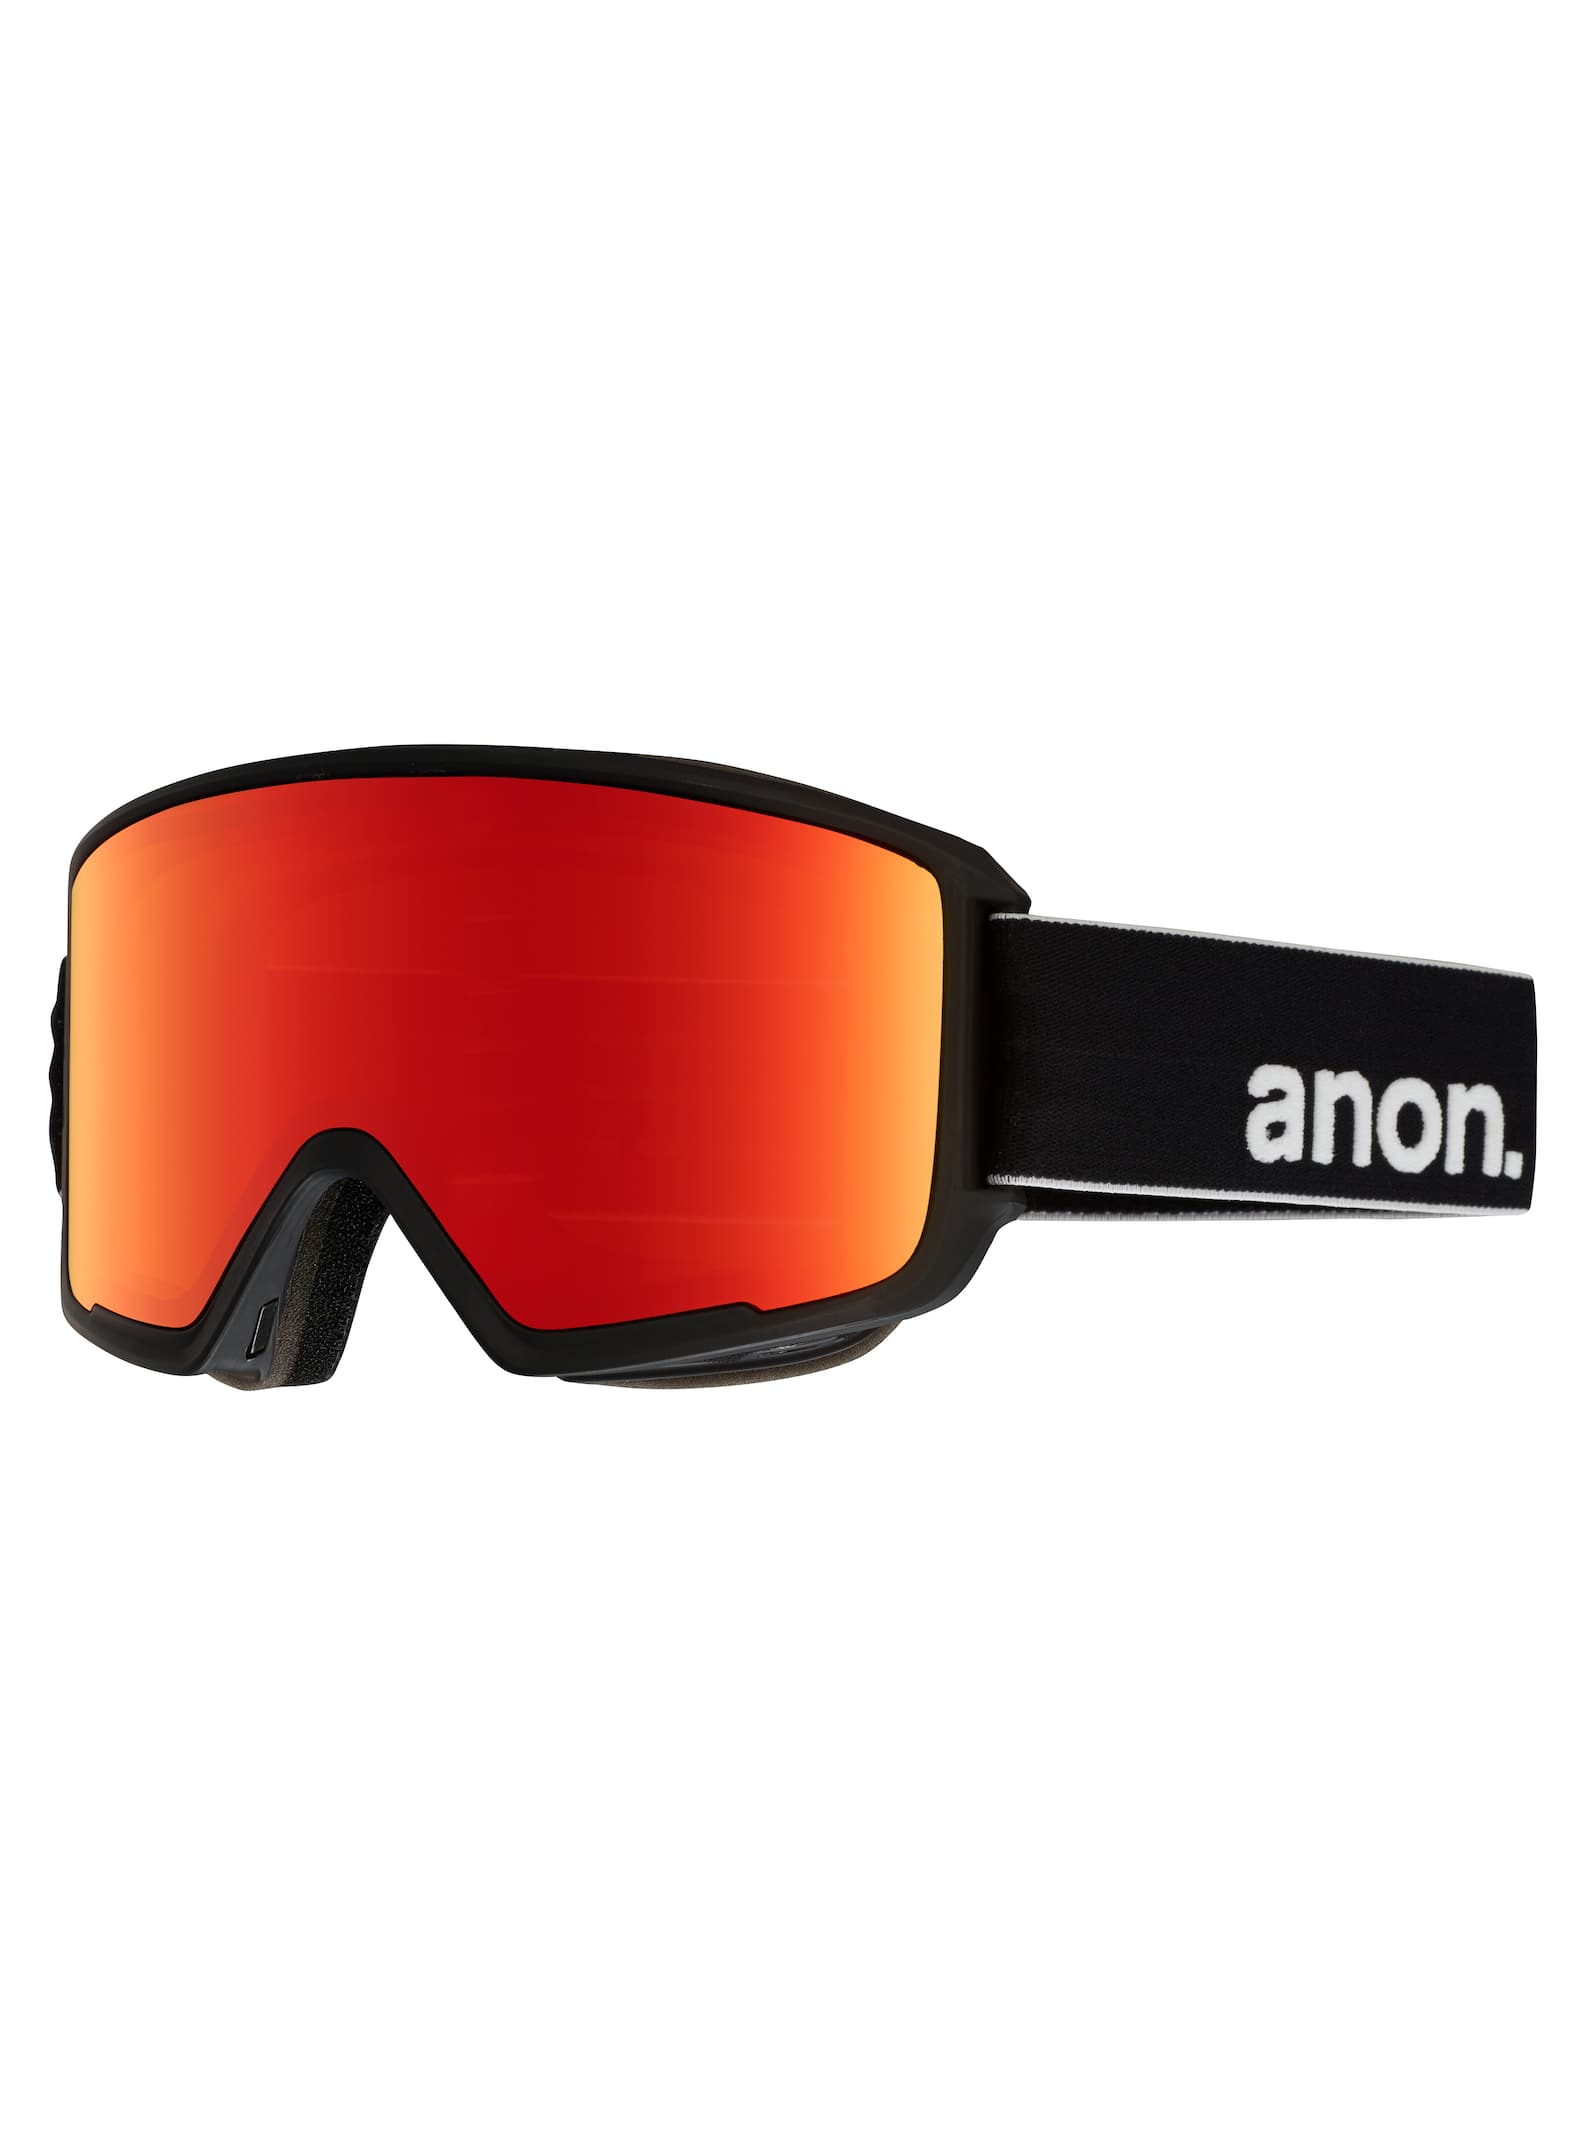 14115eed3aca Men s Anon M3 Goggle